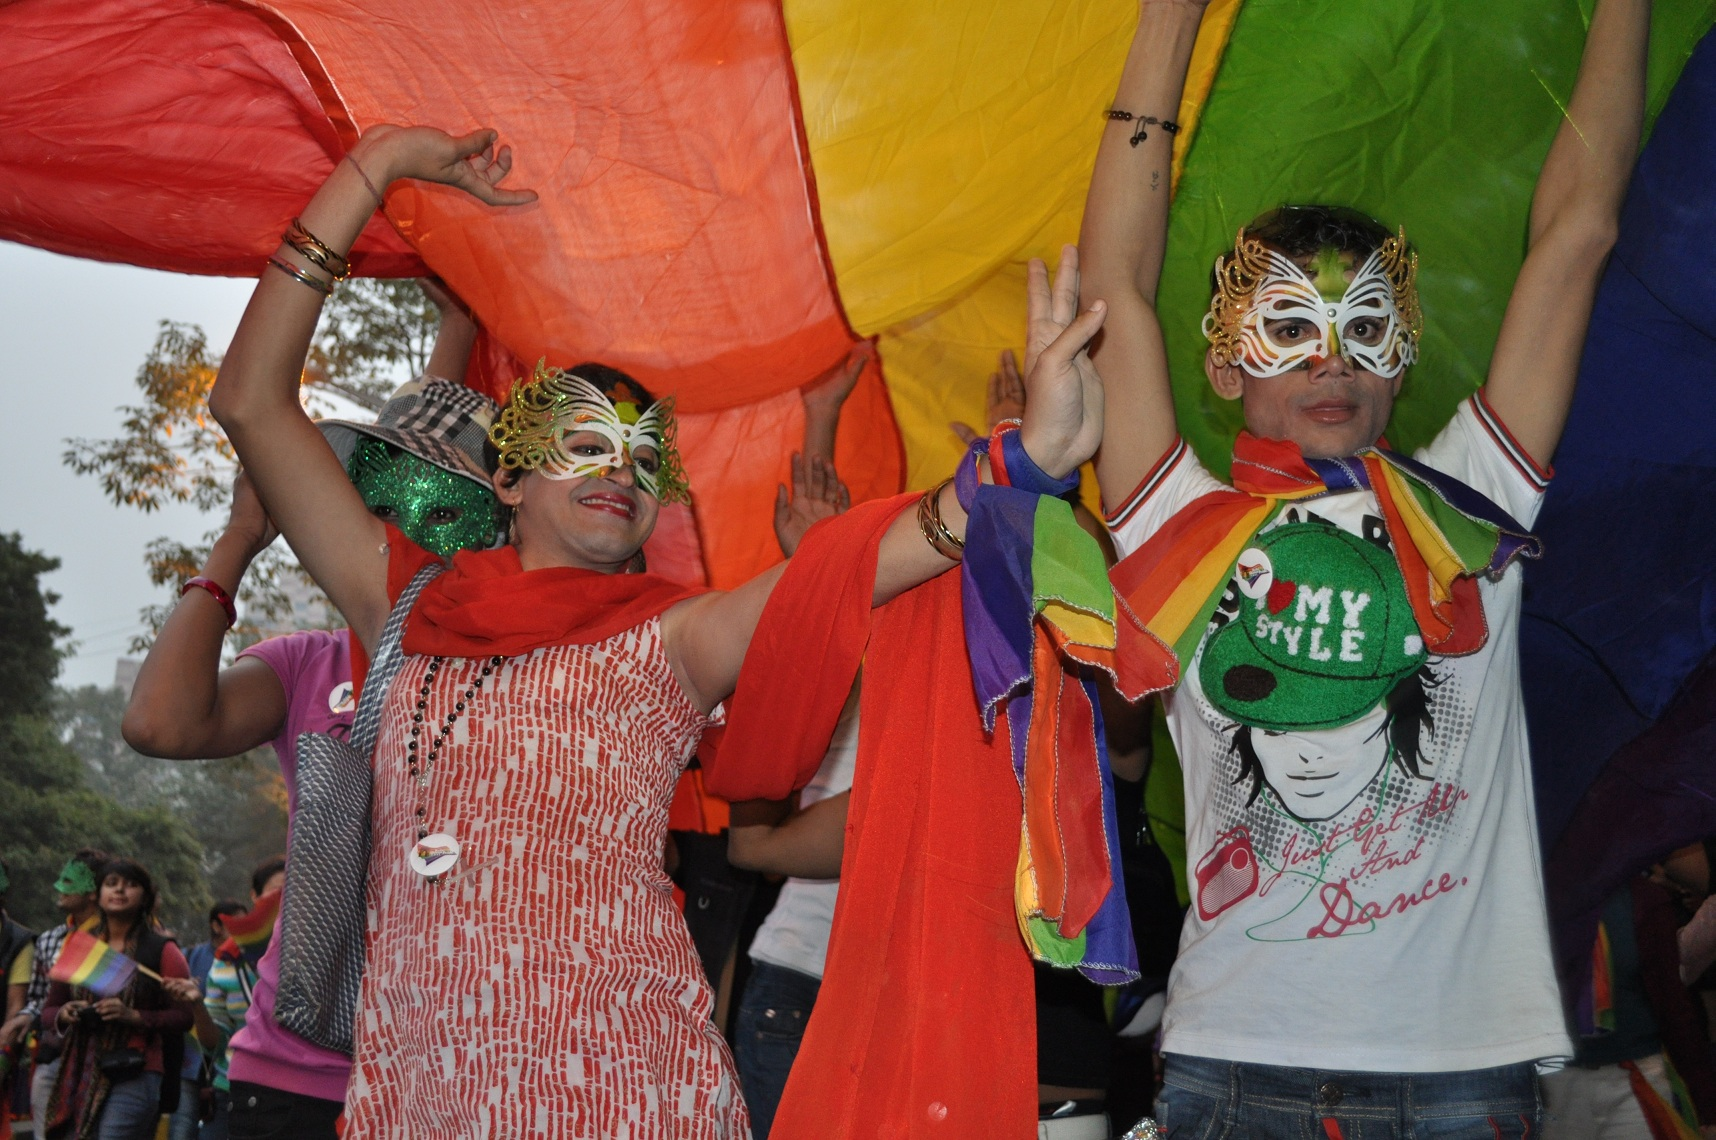 Delhi Queer Pride 2011 (Photo by: Shiv Sahoo)